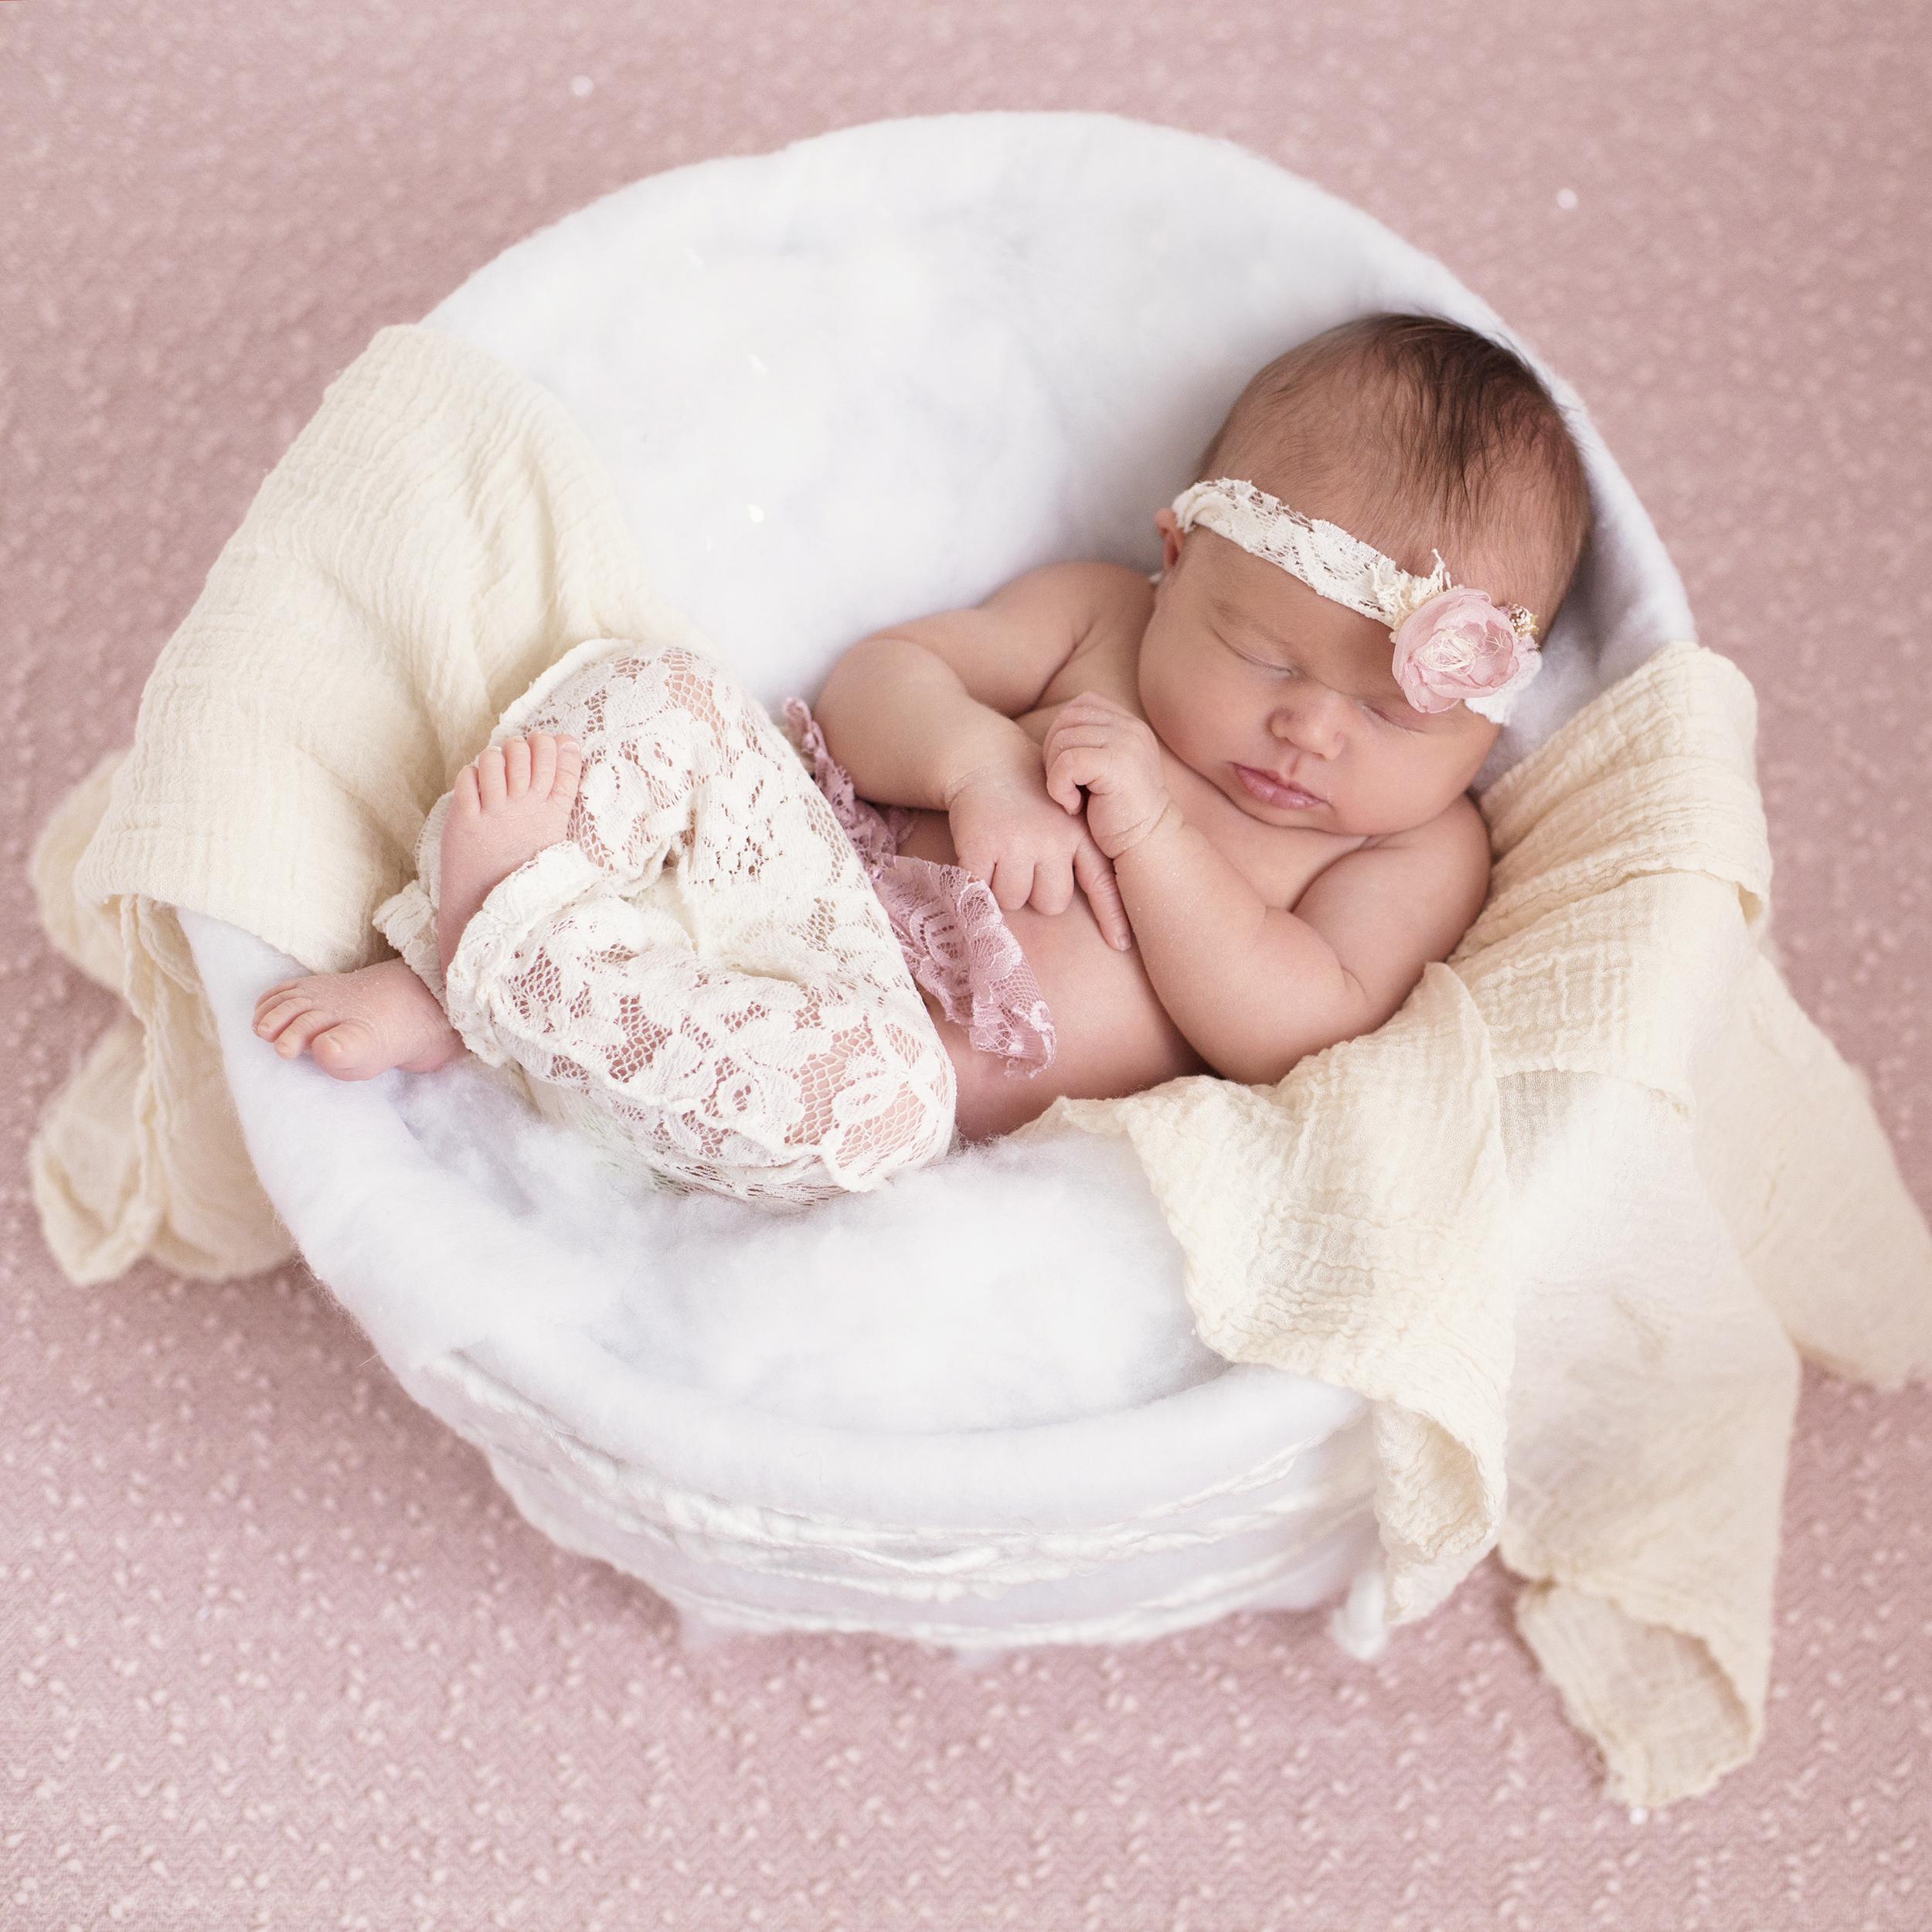 Newborn Farida Alvi Abigail_20